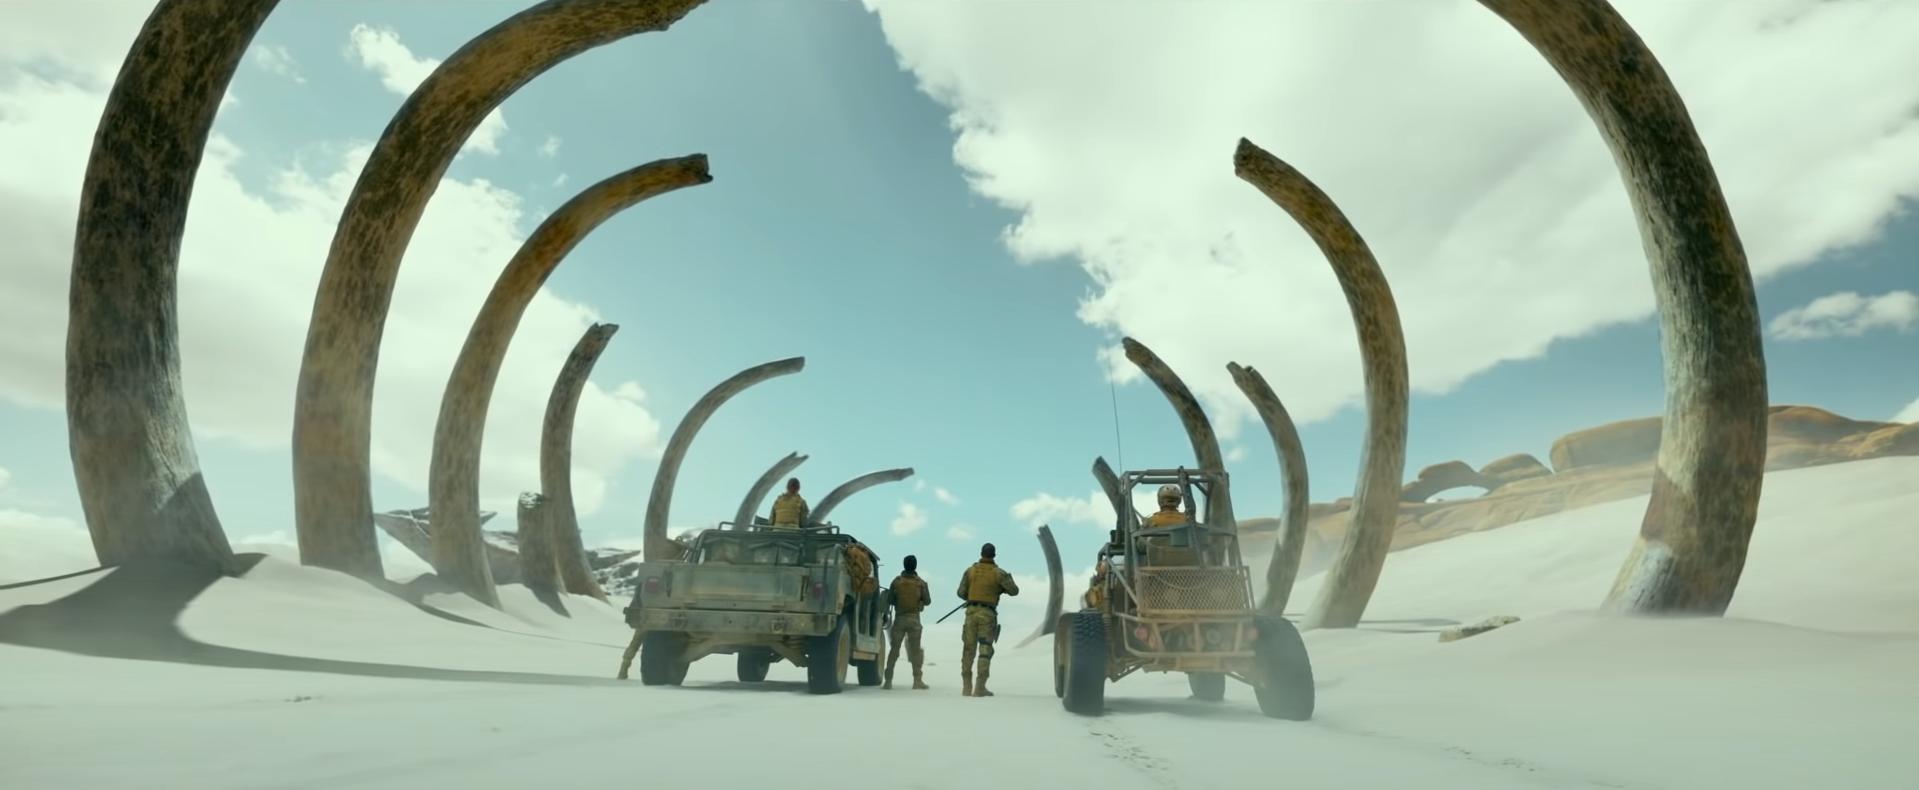 Creature bones in Monster Hunter video game movie trailer on Cinematic Doctrine